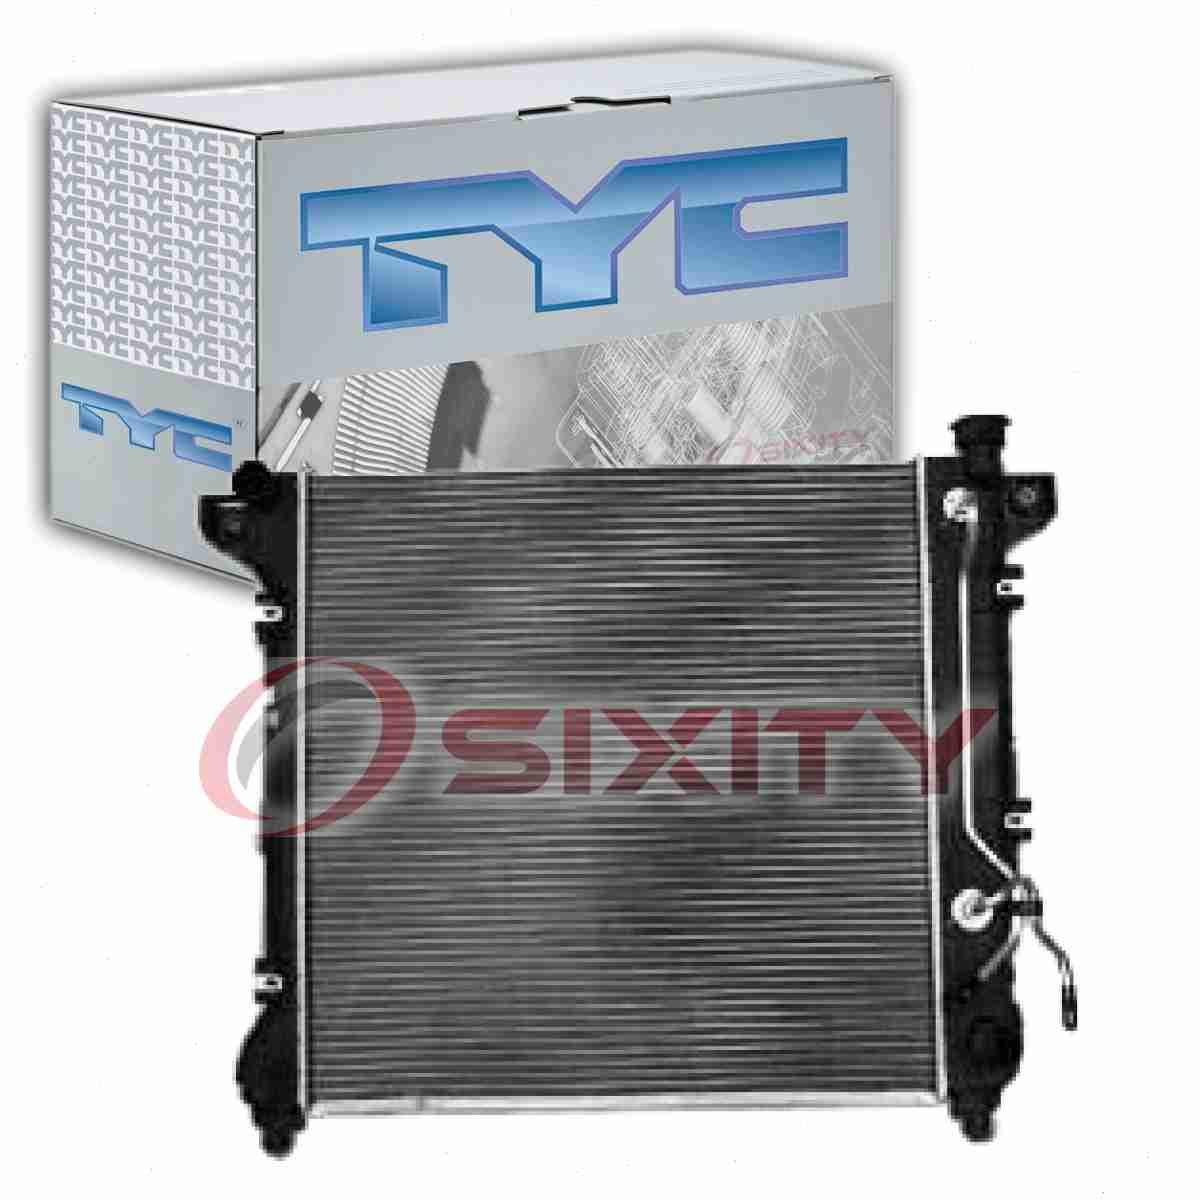 TYC Radiator Assembly for 1998-1999 Dodge Durango 5.2L V8 5.9L V8 ea